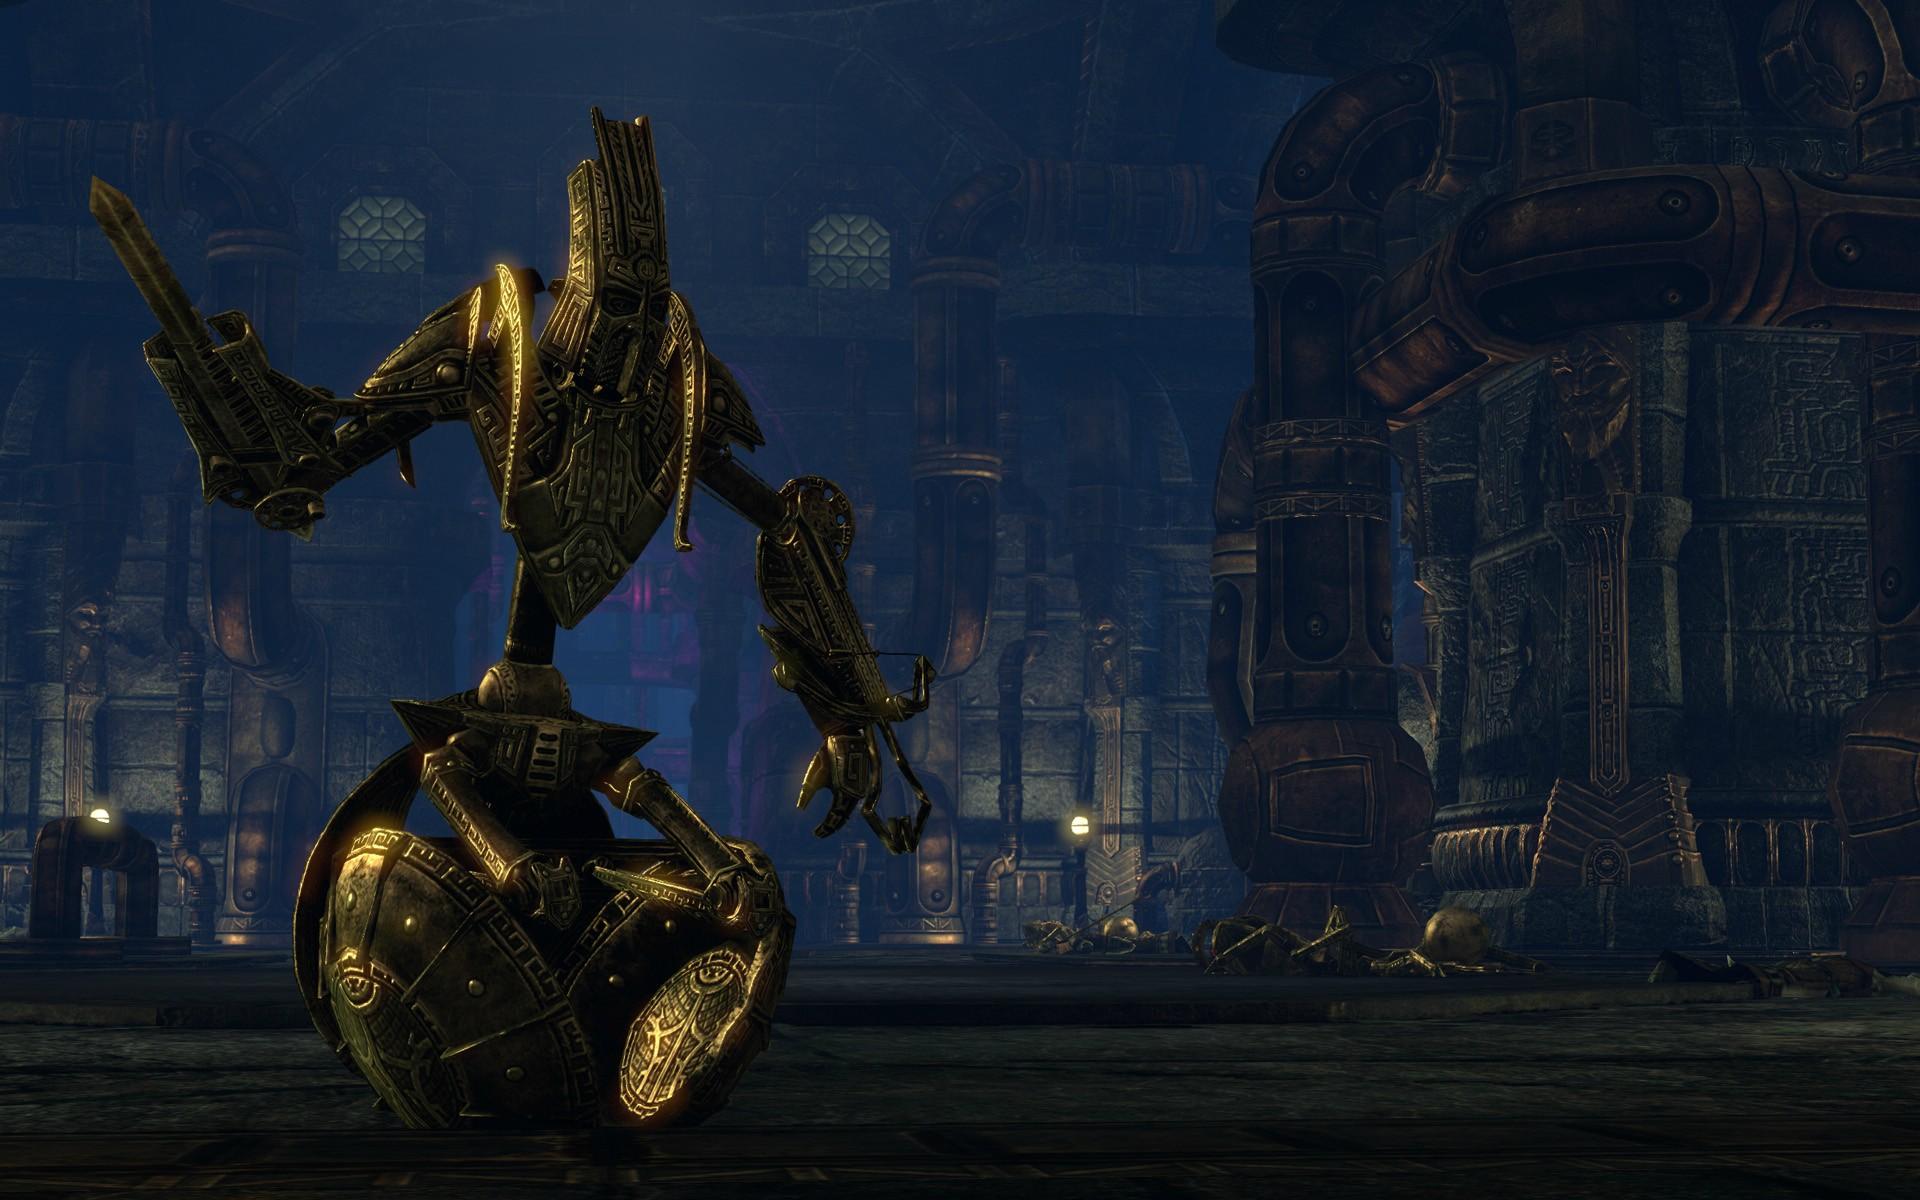 Elder Scrolls Online Screenshots Travel Across Tamriel #24400